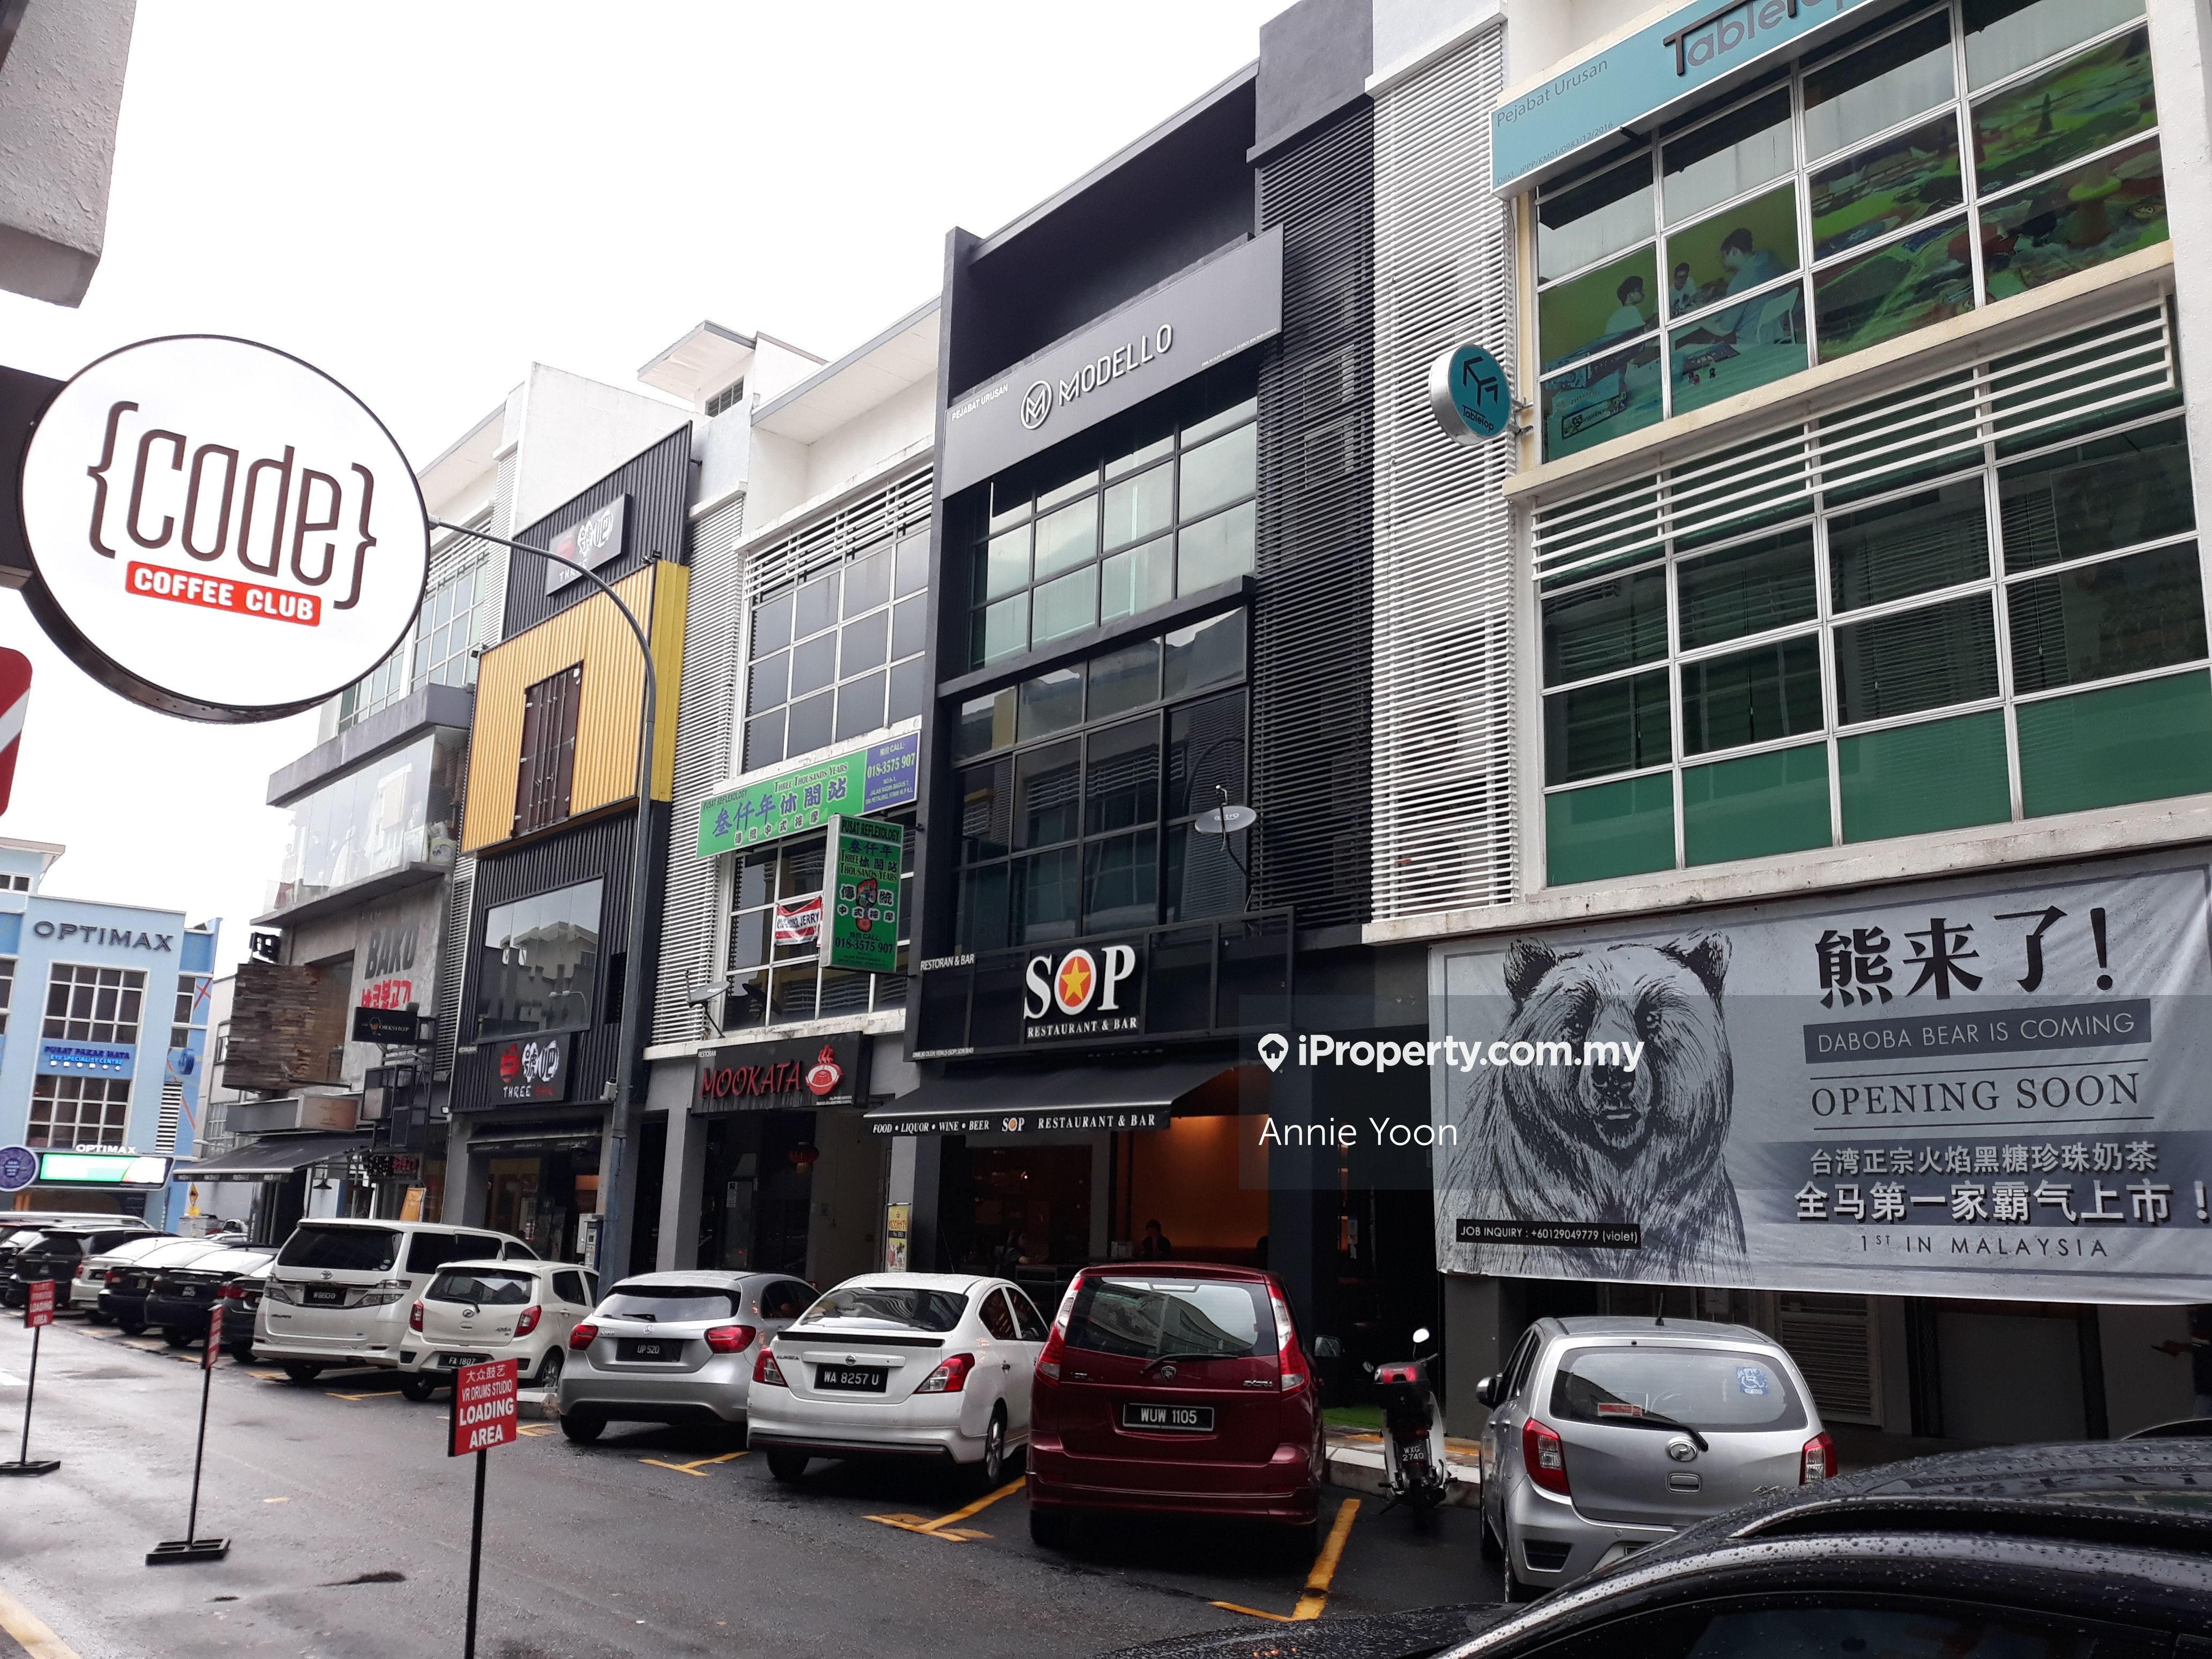 Radin Bagus, Sri Petaling, Jalan Radin Bagus, Bandar Baru Sri Petaling, Sri Petaling